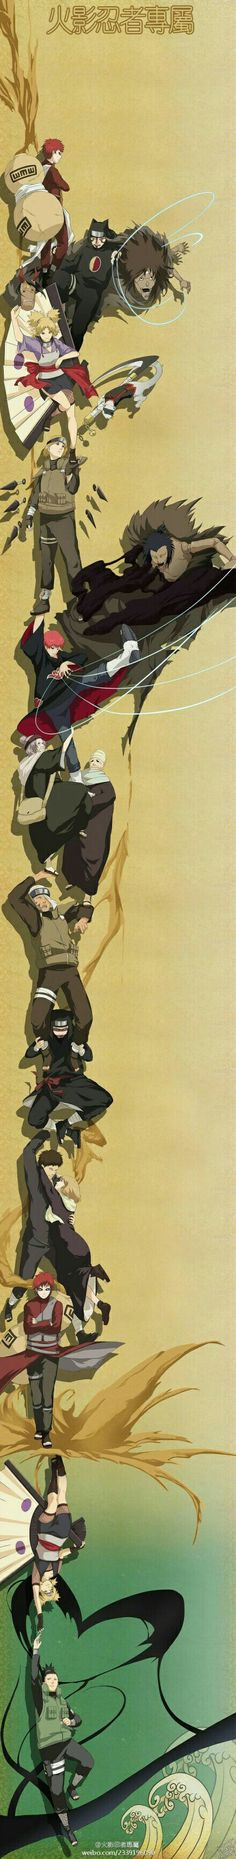 Sand ninja, Sand Siblings, Gaara, Temari, Kankuro, Baki, Sasori, Shikamaru, elders, Chiyo; Naruto